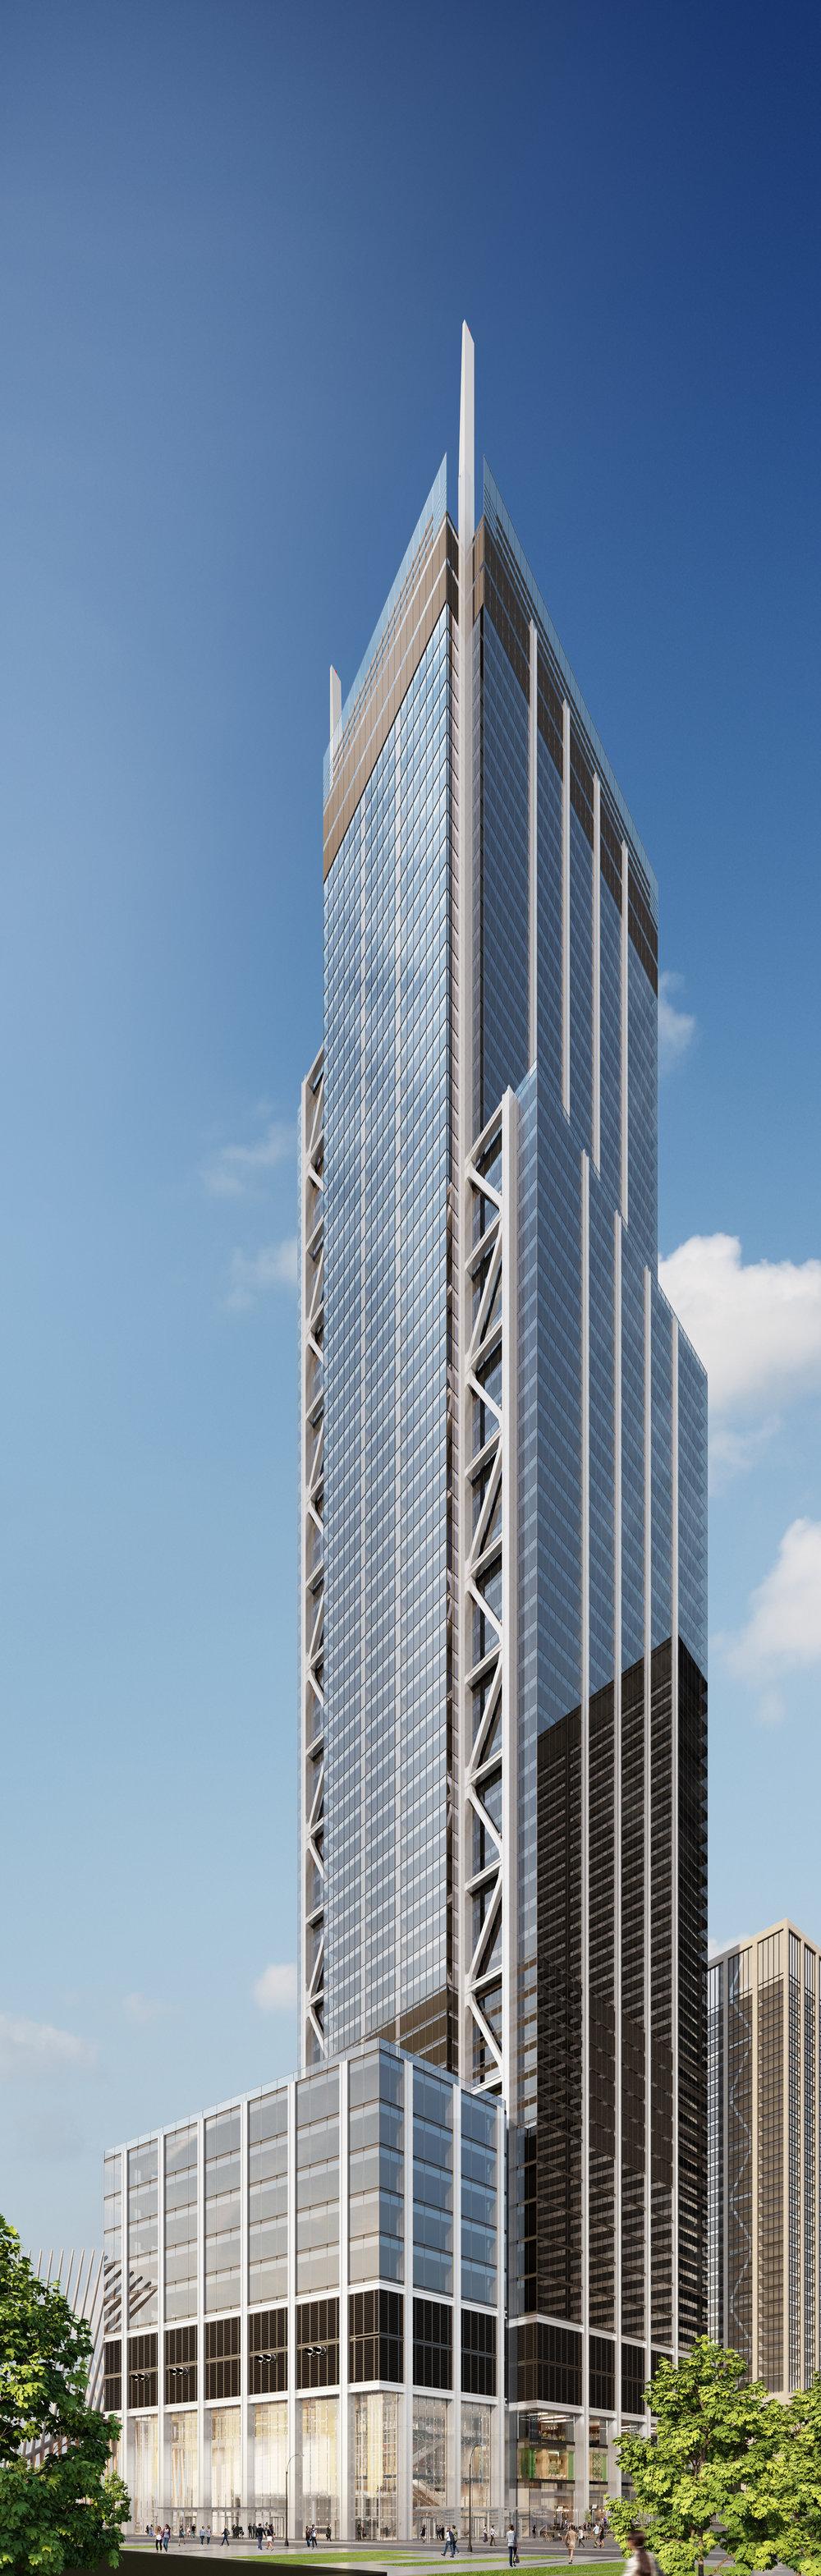 World Trade 3 - Still - Marketing - Greenwich St Tower HHR People.jpg